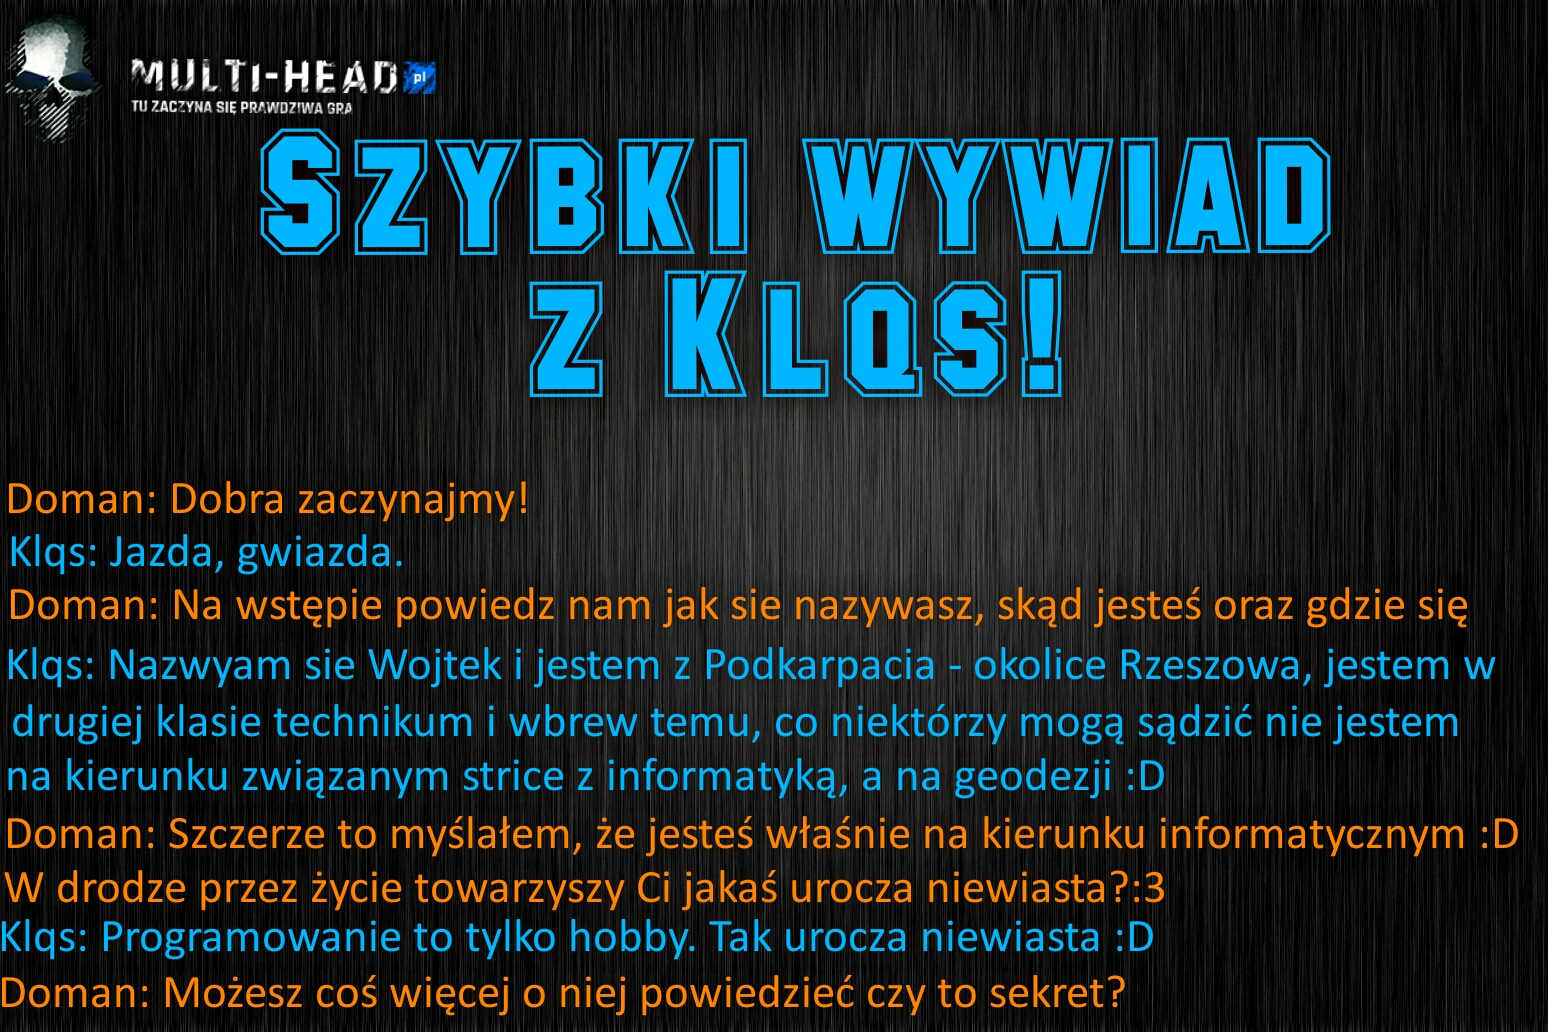 piZap_1511700607145.jpg